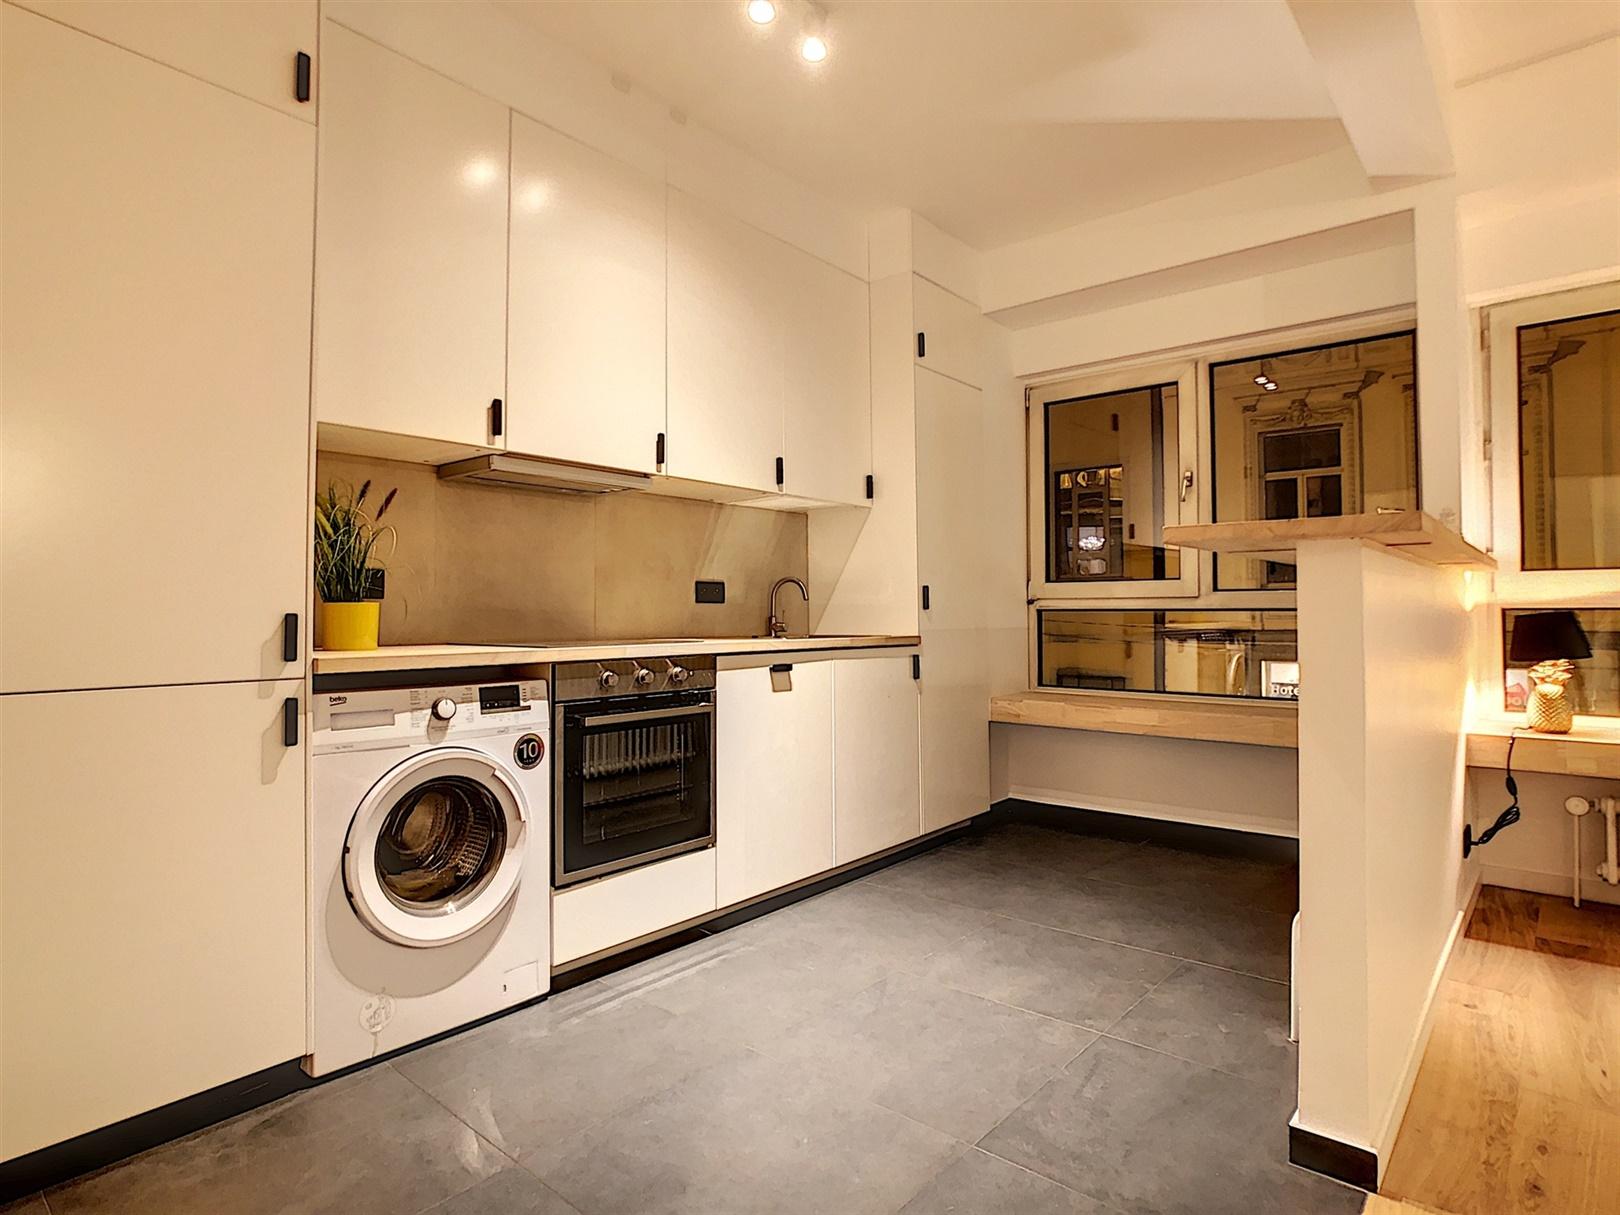 Knap appartement in centrum Gent!